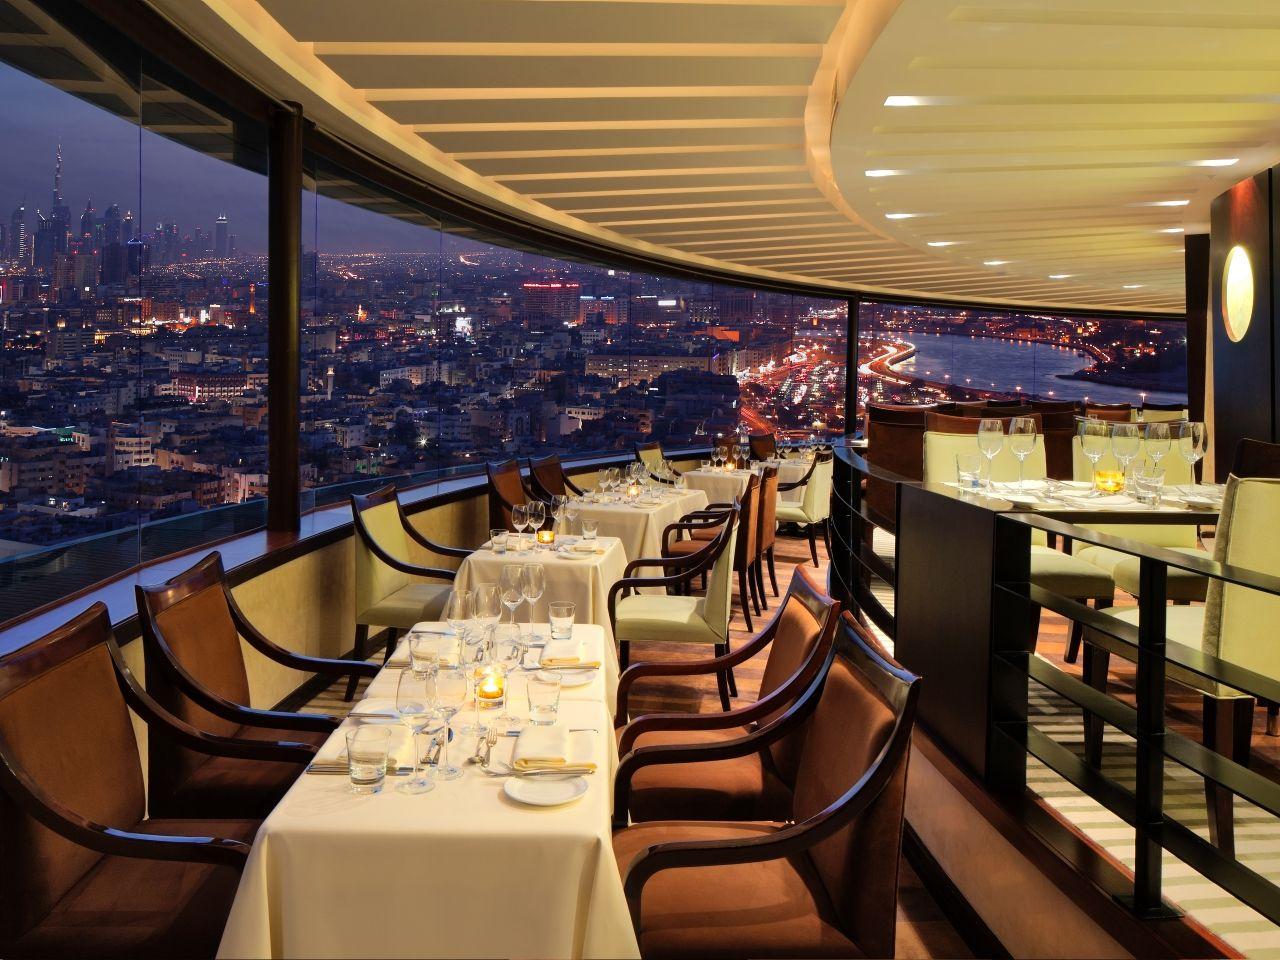 Dine on a revolving rooftop atAl Dawaar restaurant in Dubai